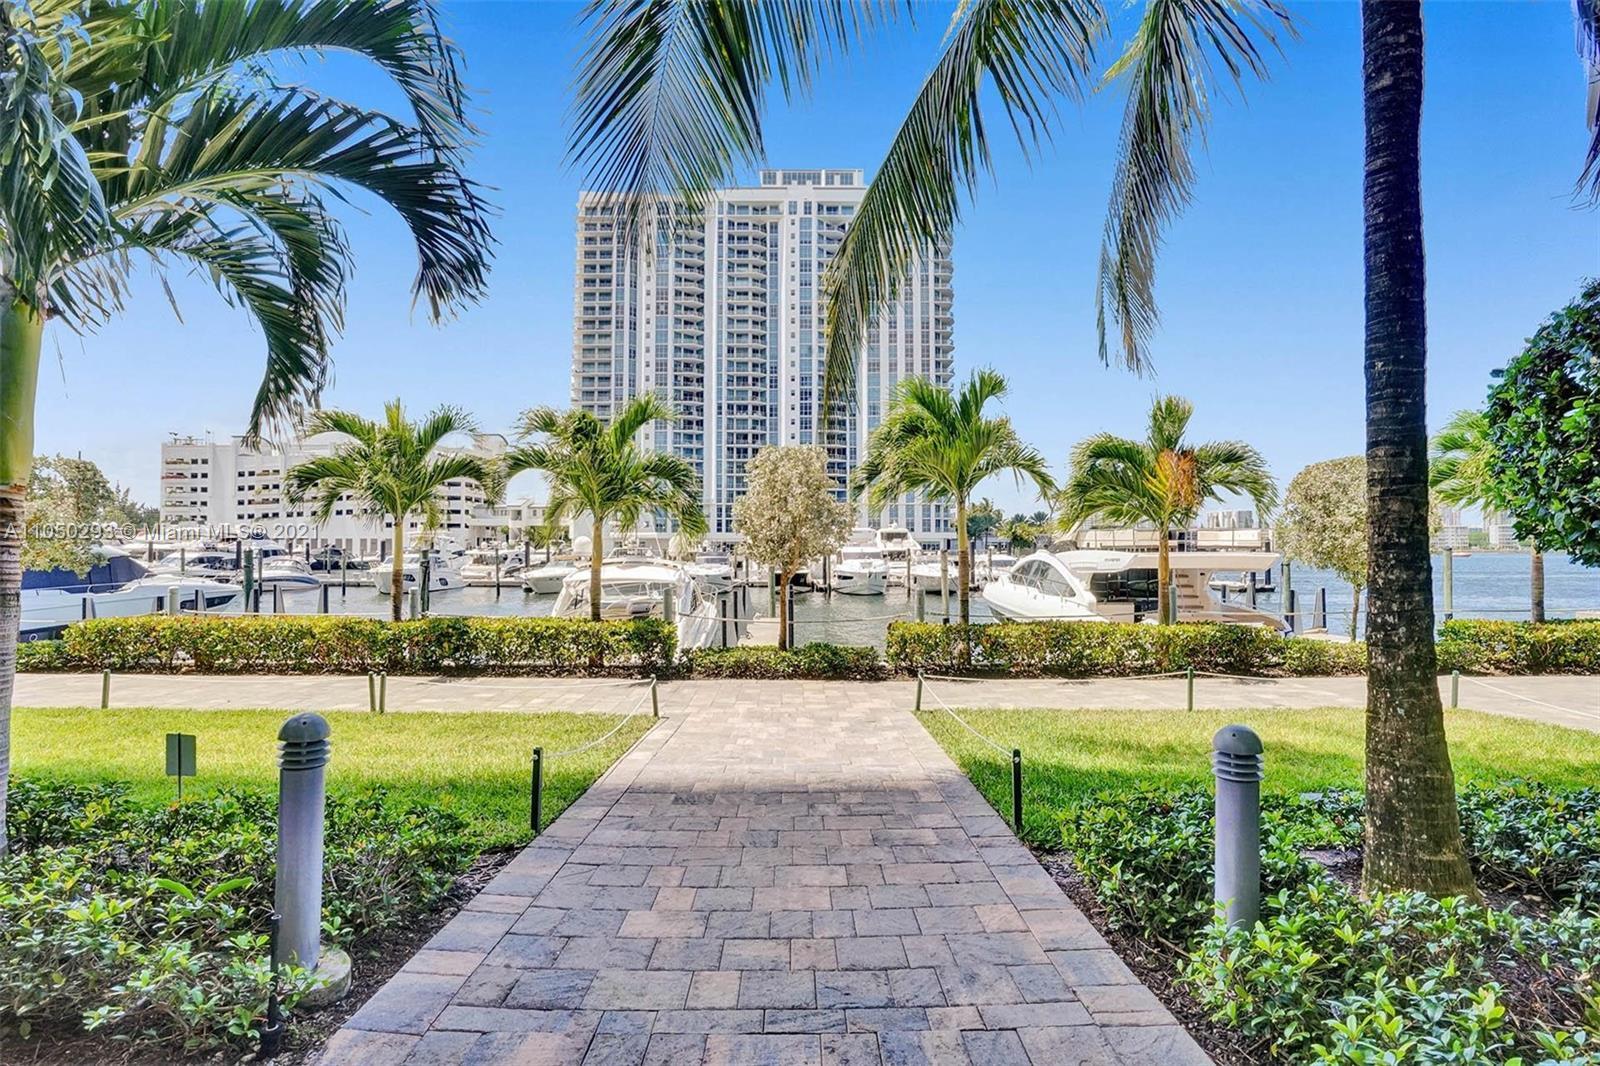 Marina Palms 1 #804 - 17111 Biscayne Blvd #804, North Miami Beach, FL 33160